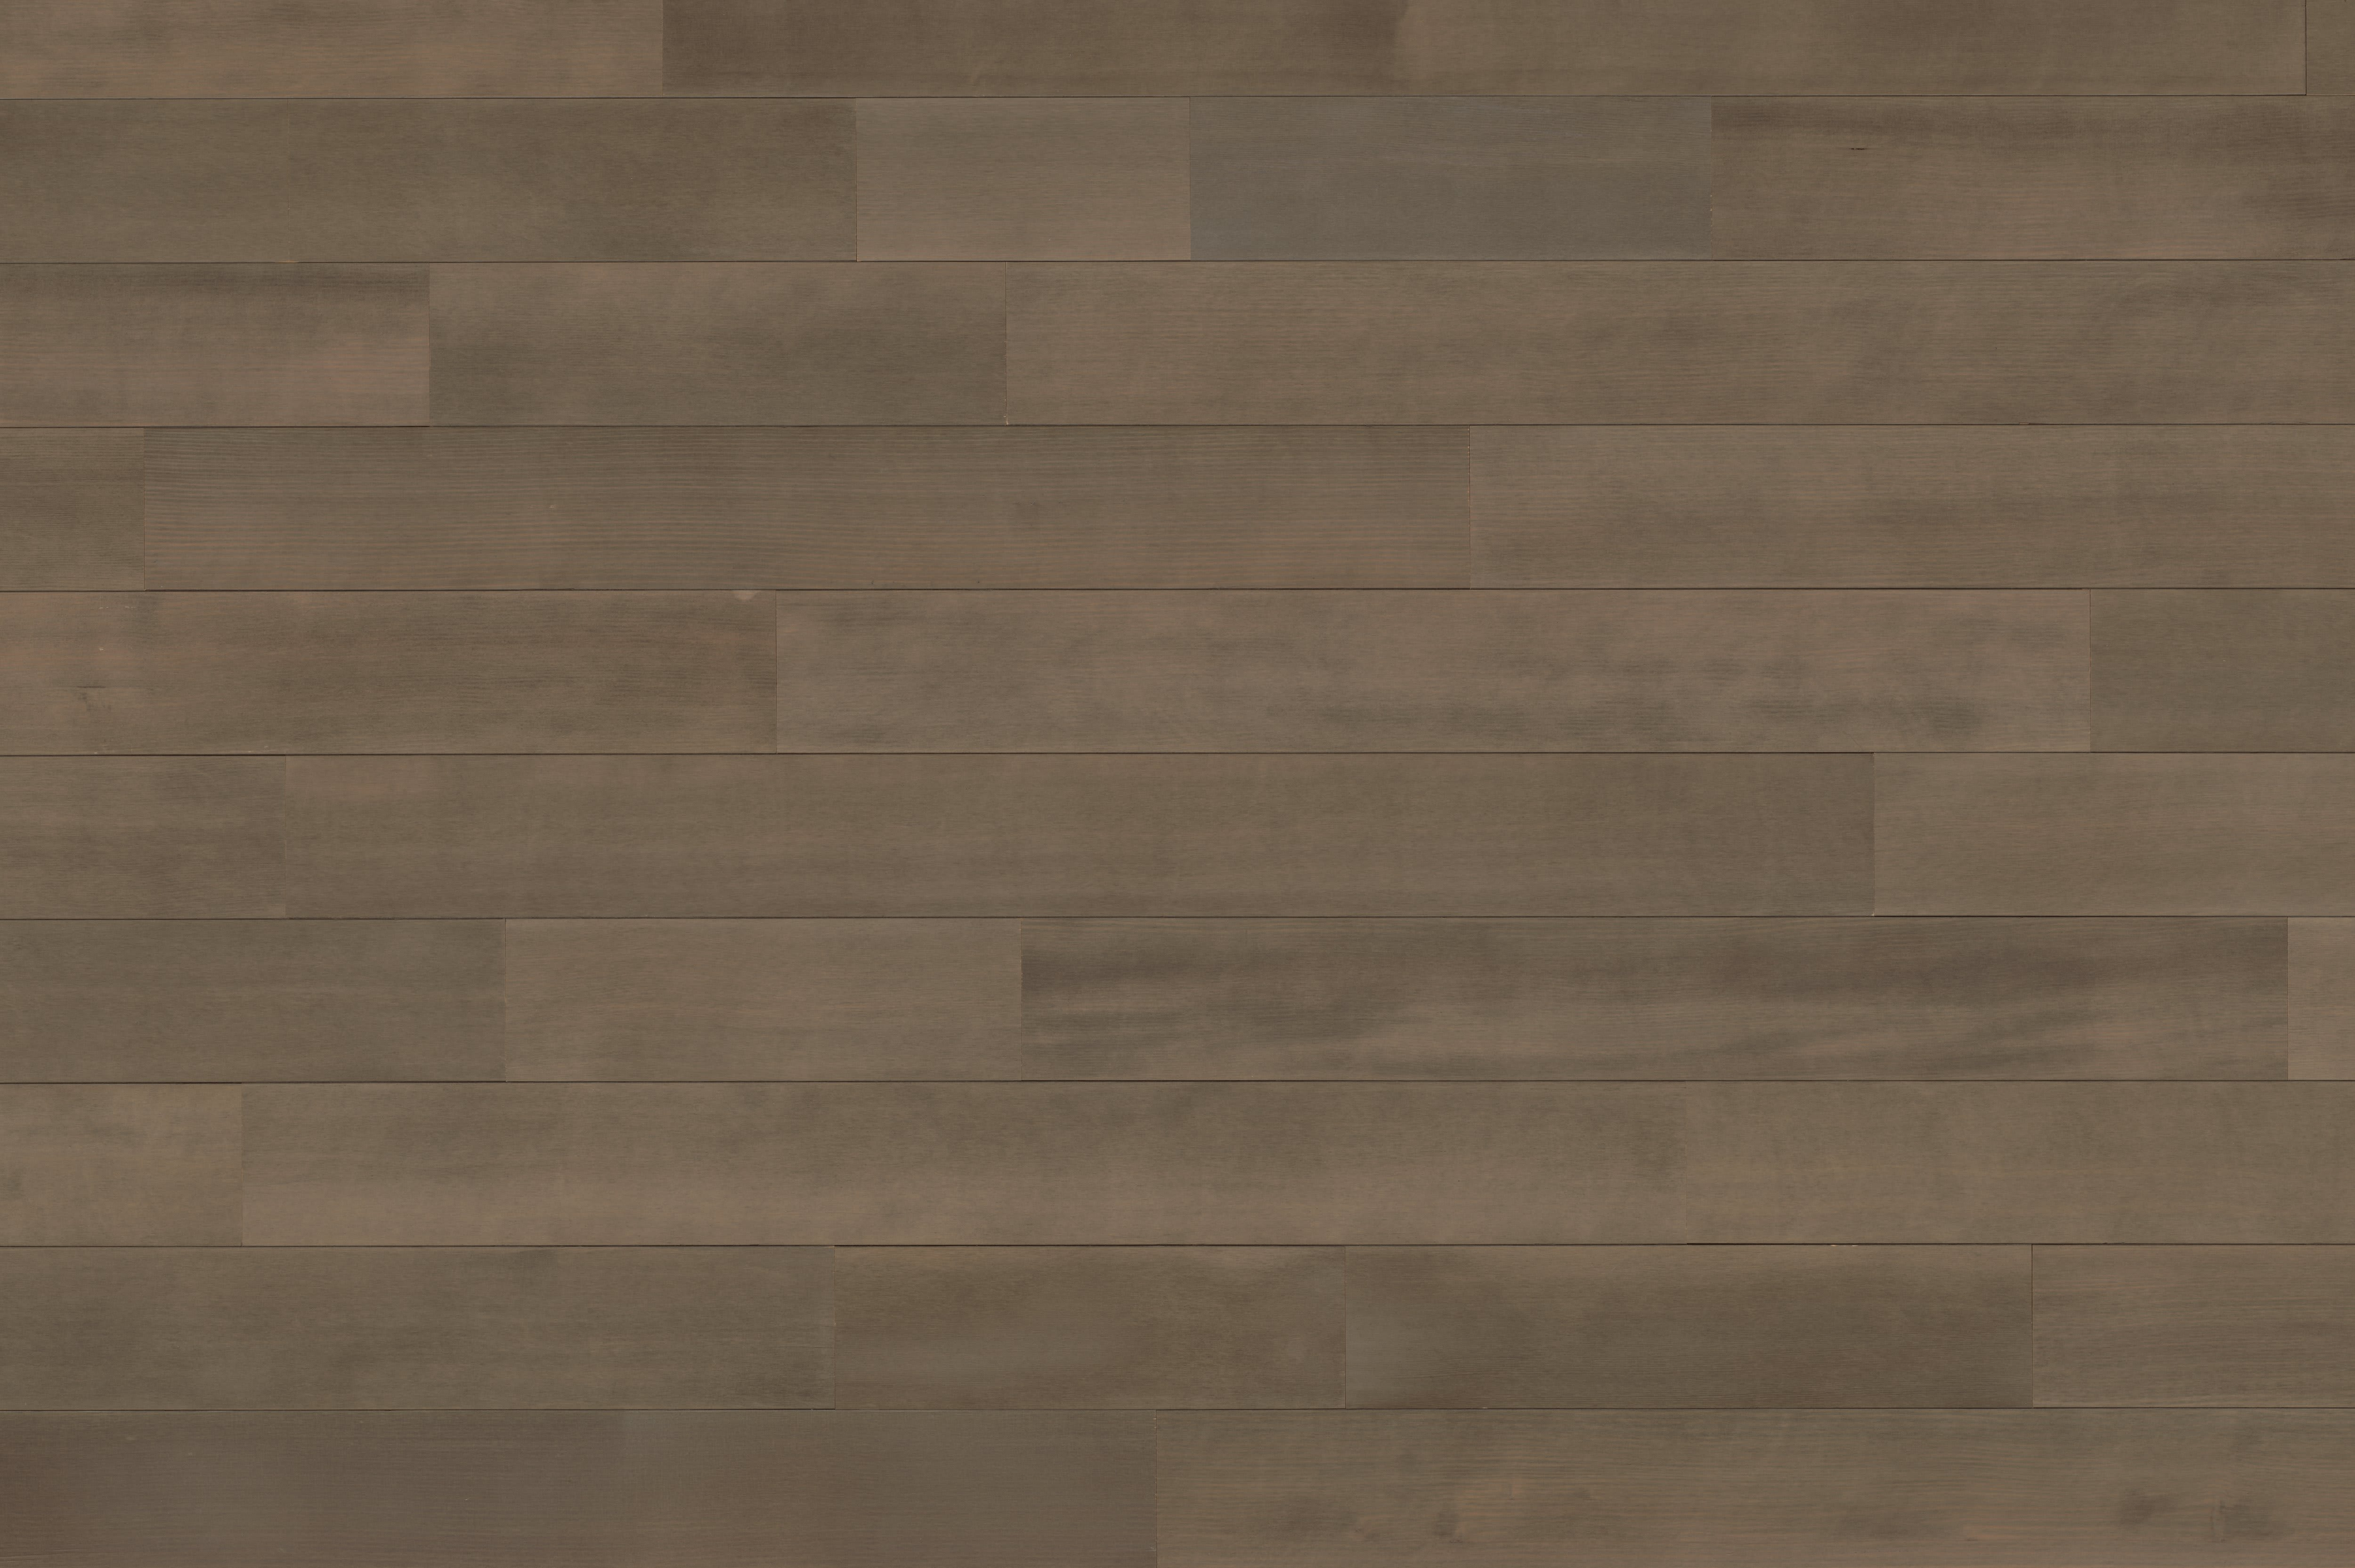 Vertical Grain Rustic Slate peel and stick wood